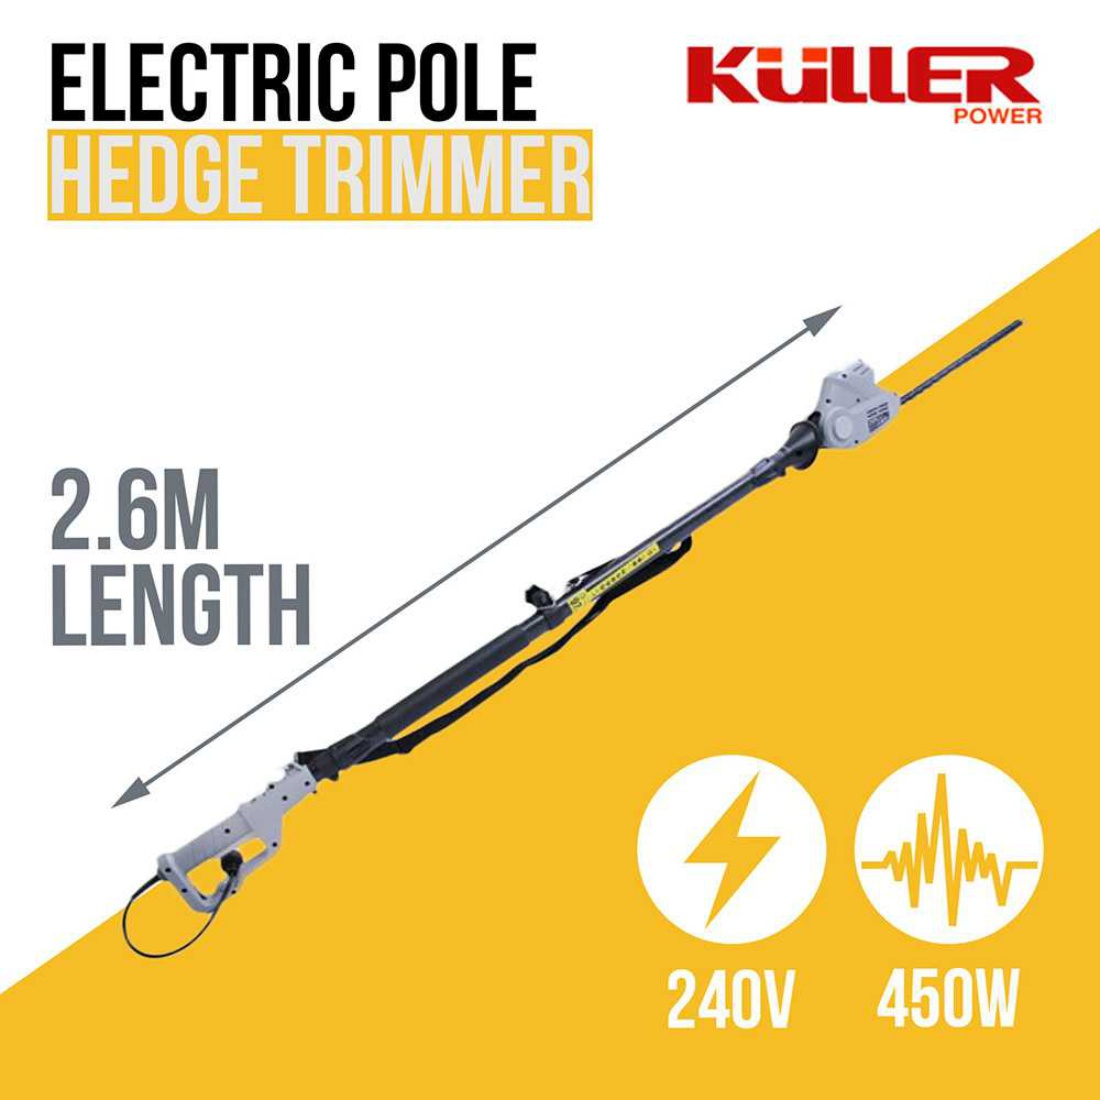 240V Electric Pole Hedge Trimmer Outdoor Backyard Garden Power Tools Long Reach